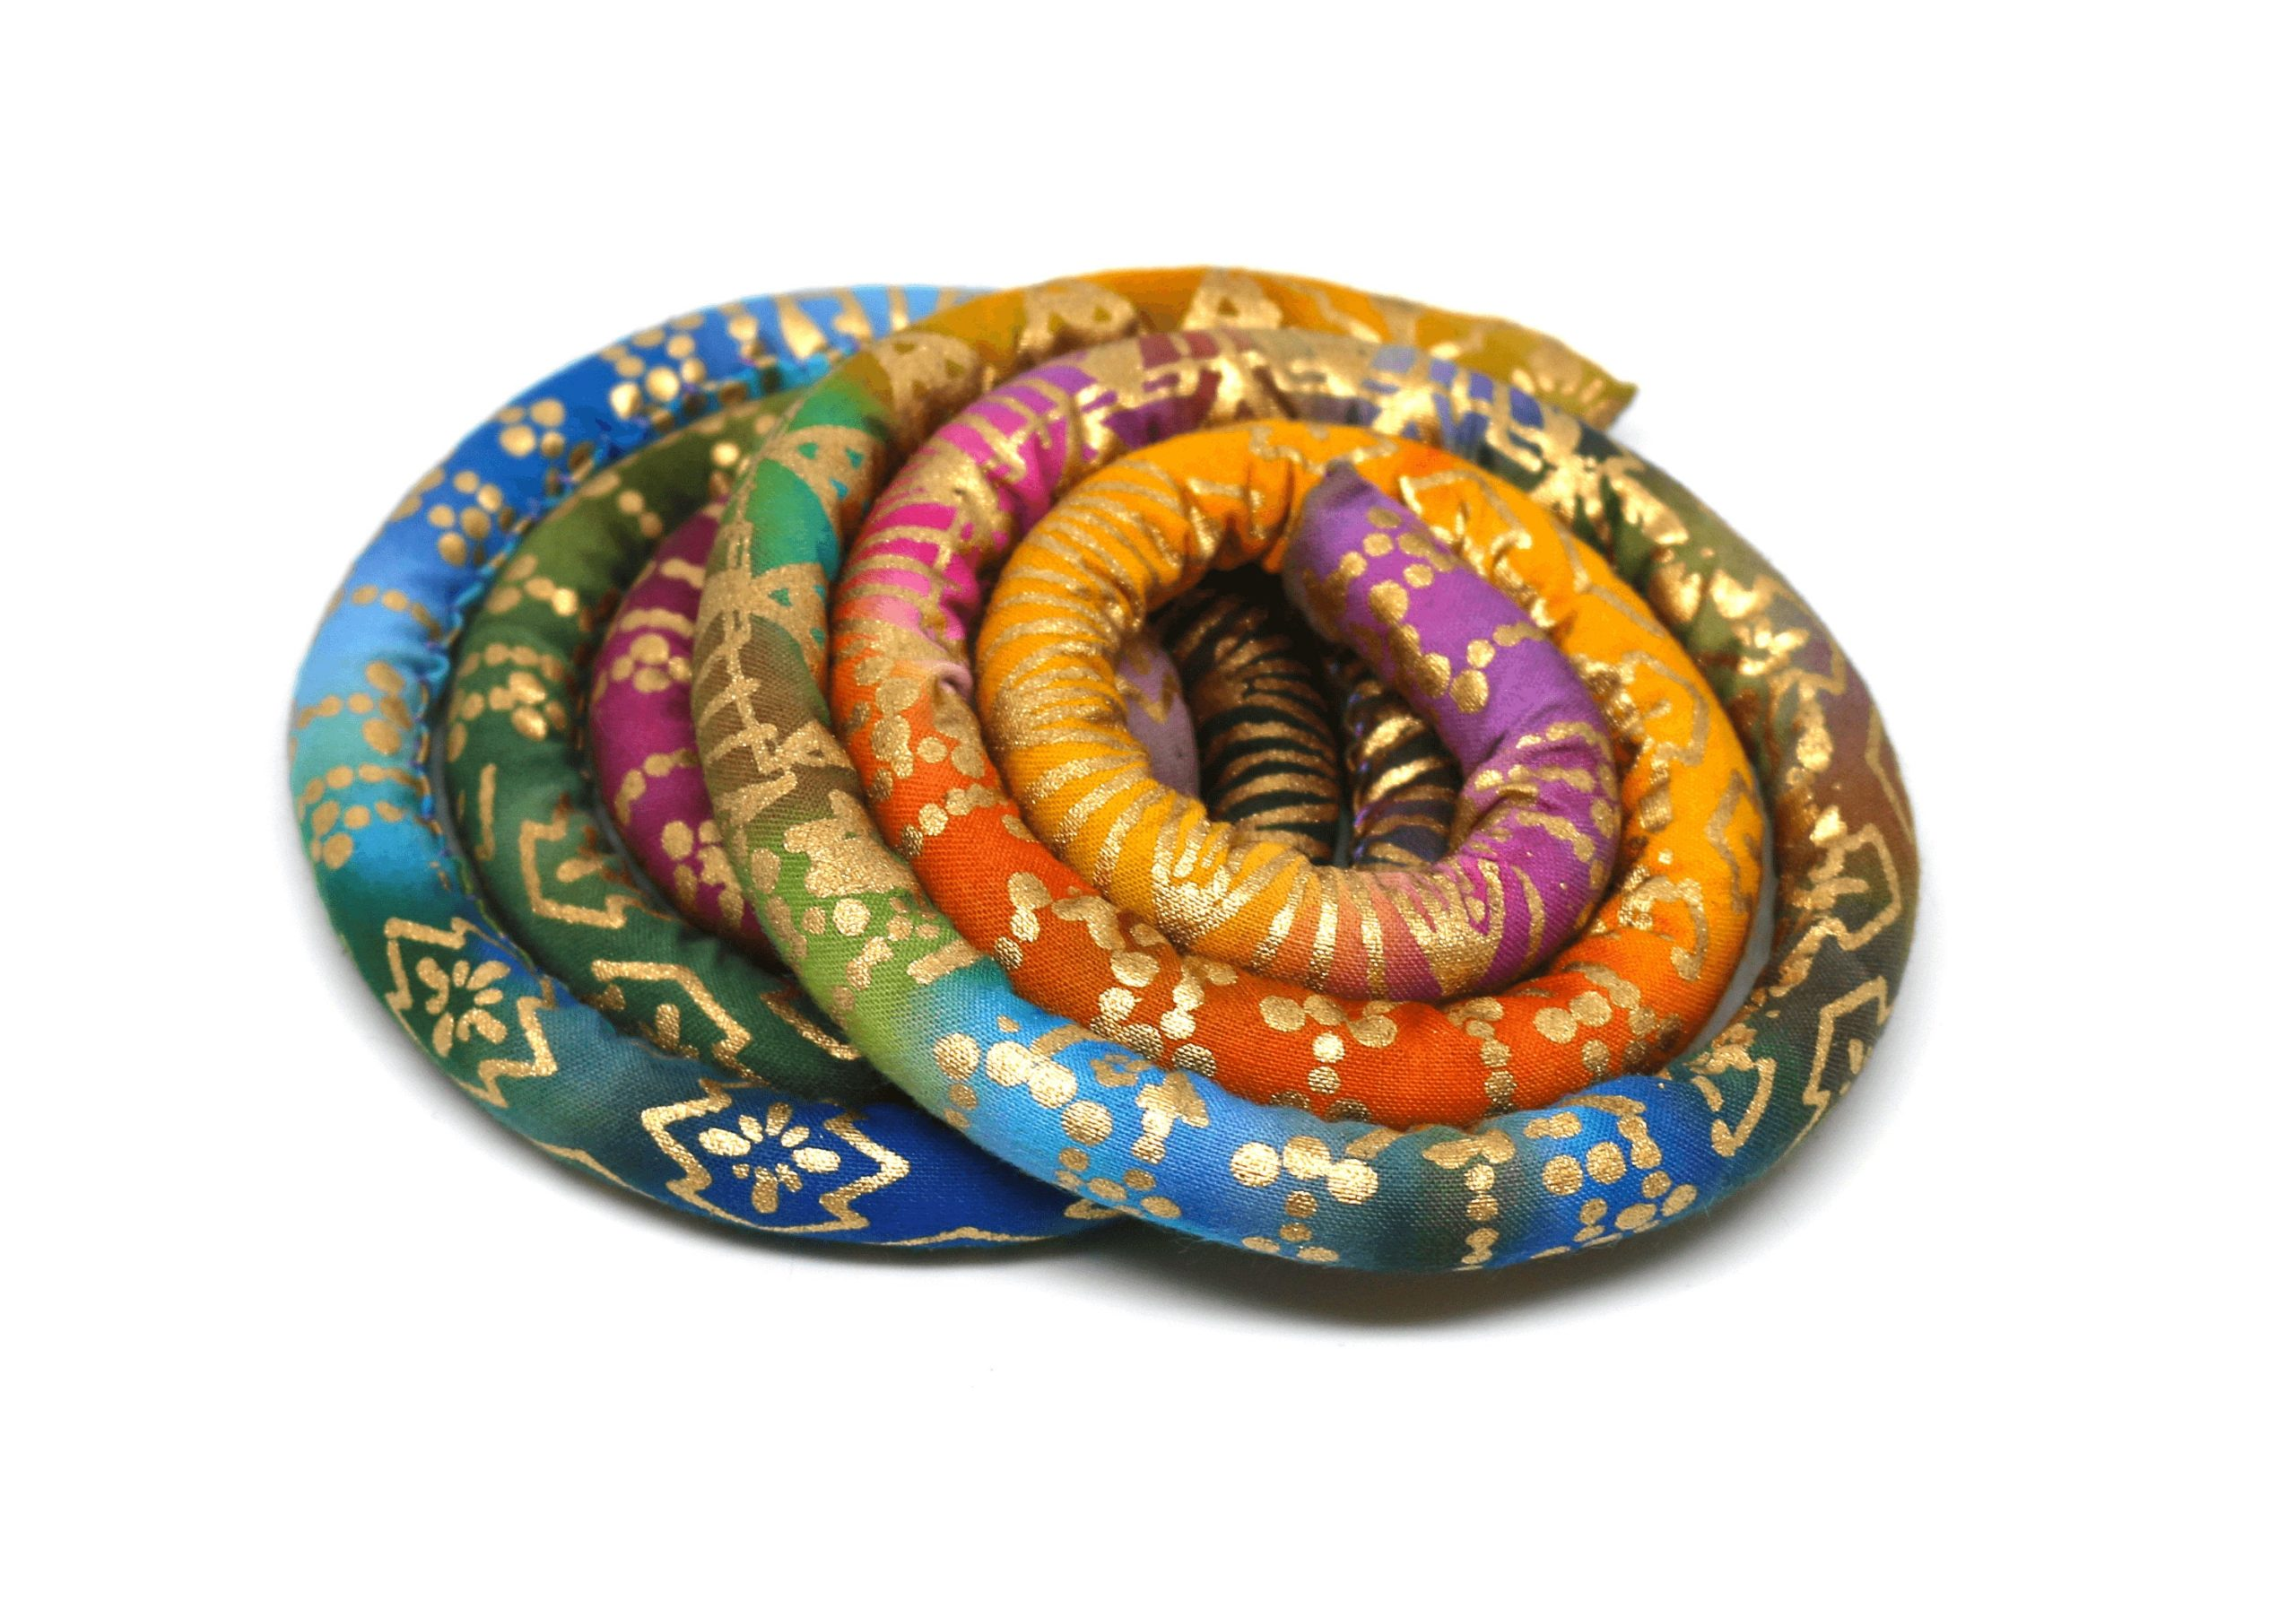 SpiraLocks-Dreadlocks-Schmuck-Dreadschmuck-Accessoires-Haare-Afro-Rasta-Zopf-Shop-Regenbogen